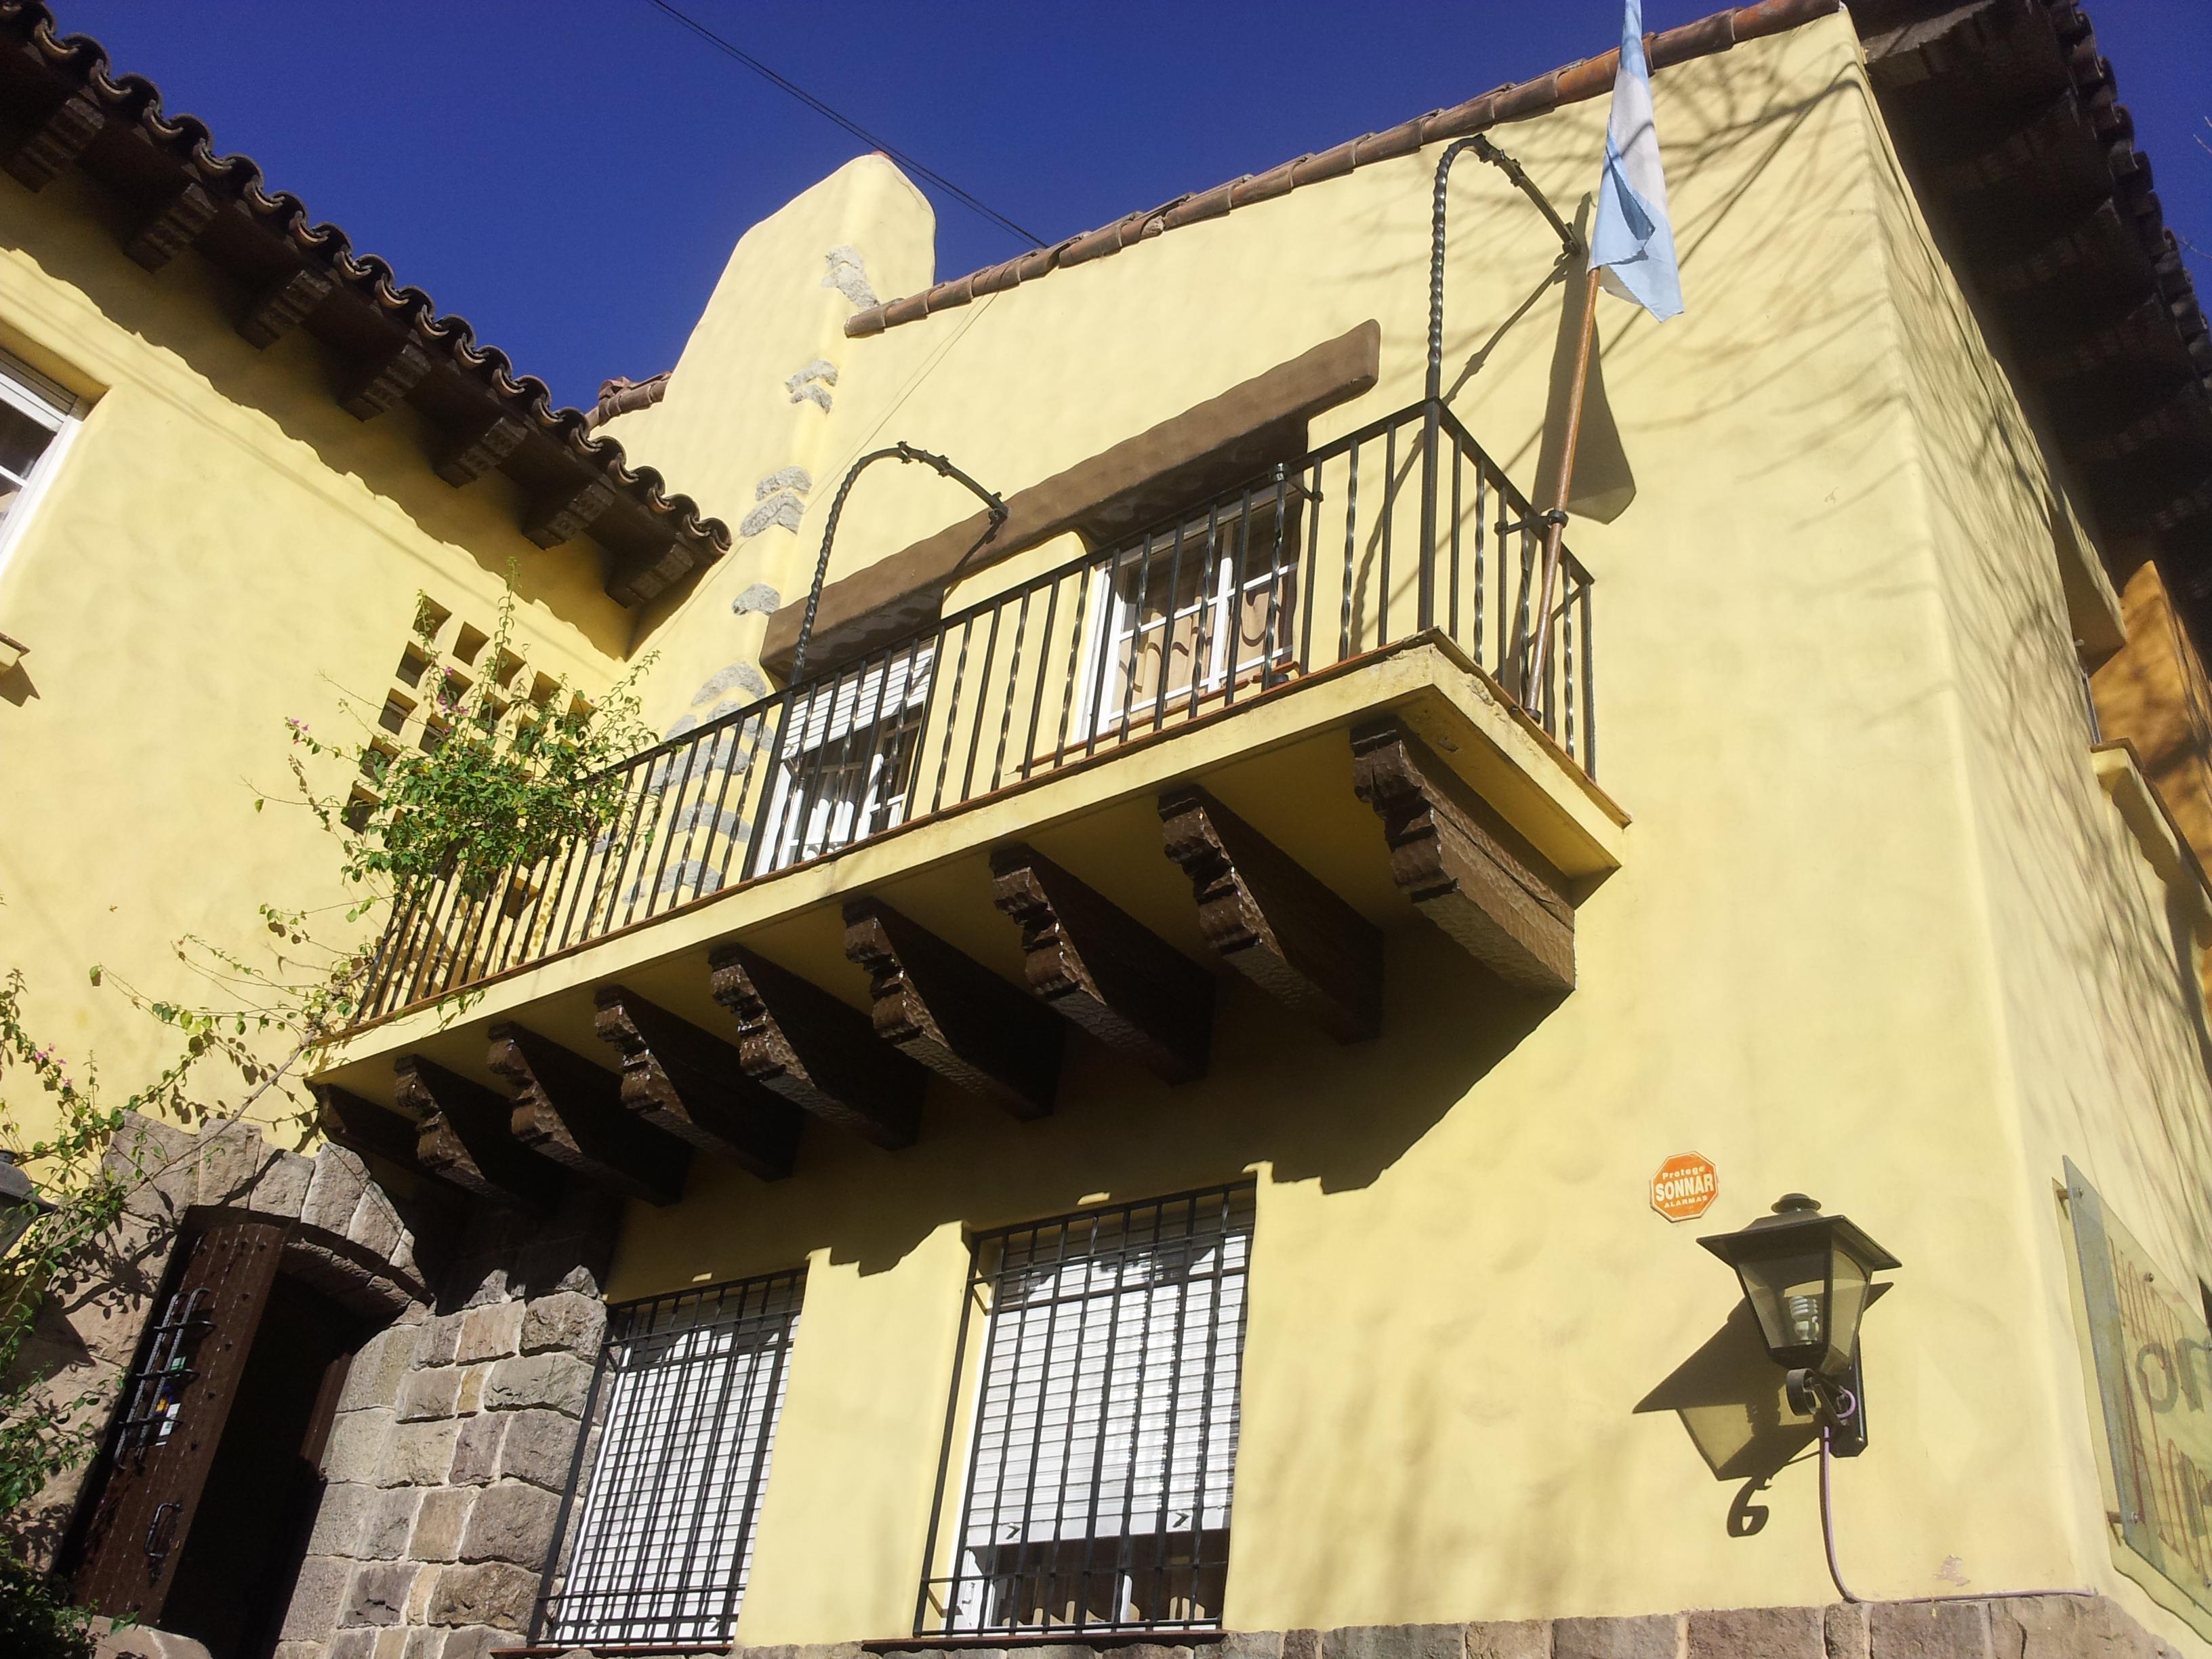 Hostel Alamo